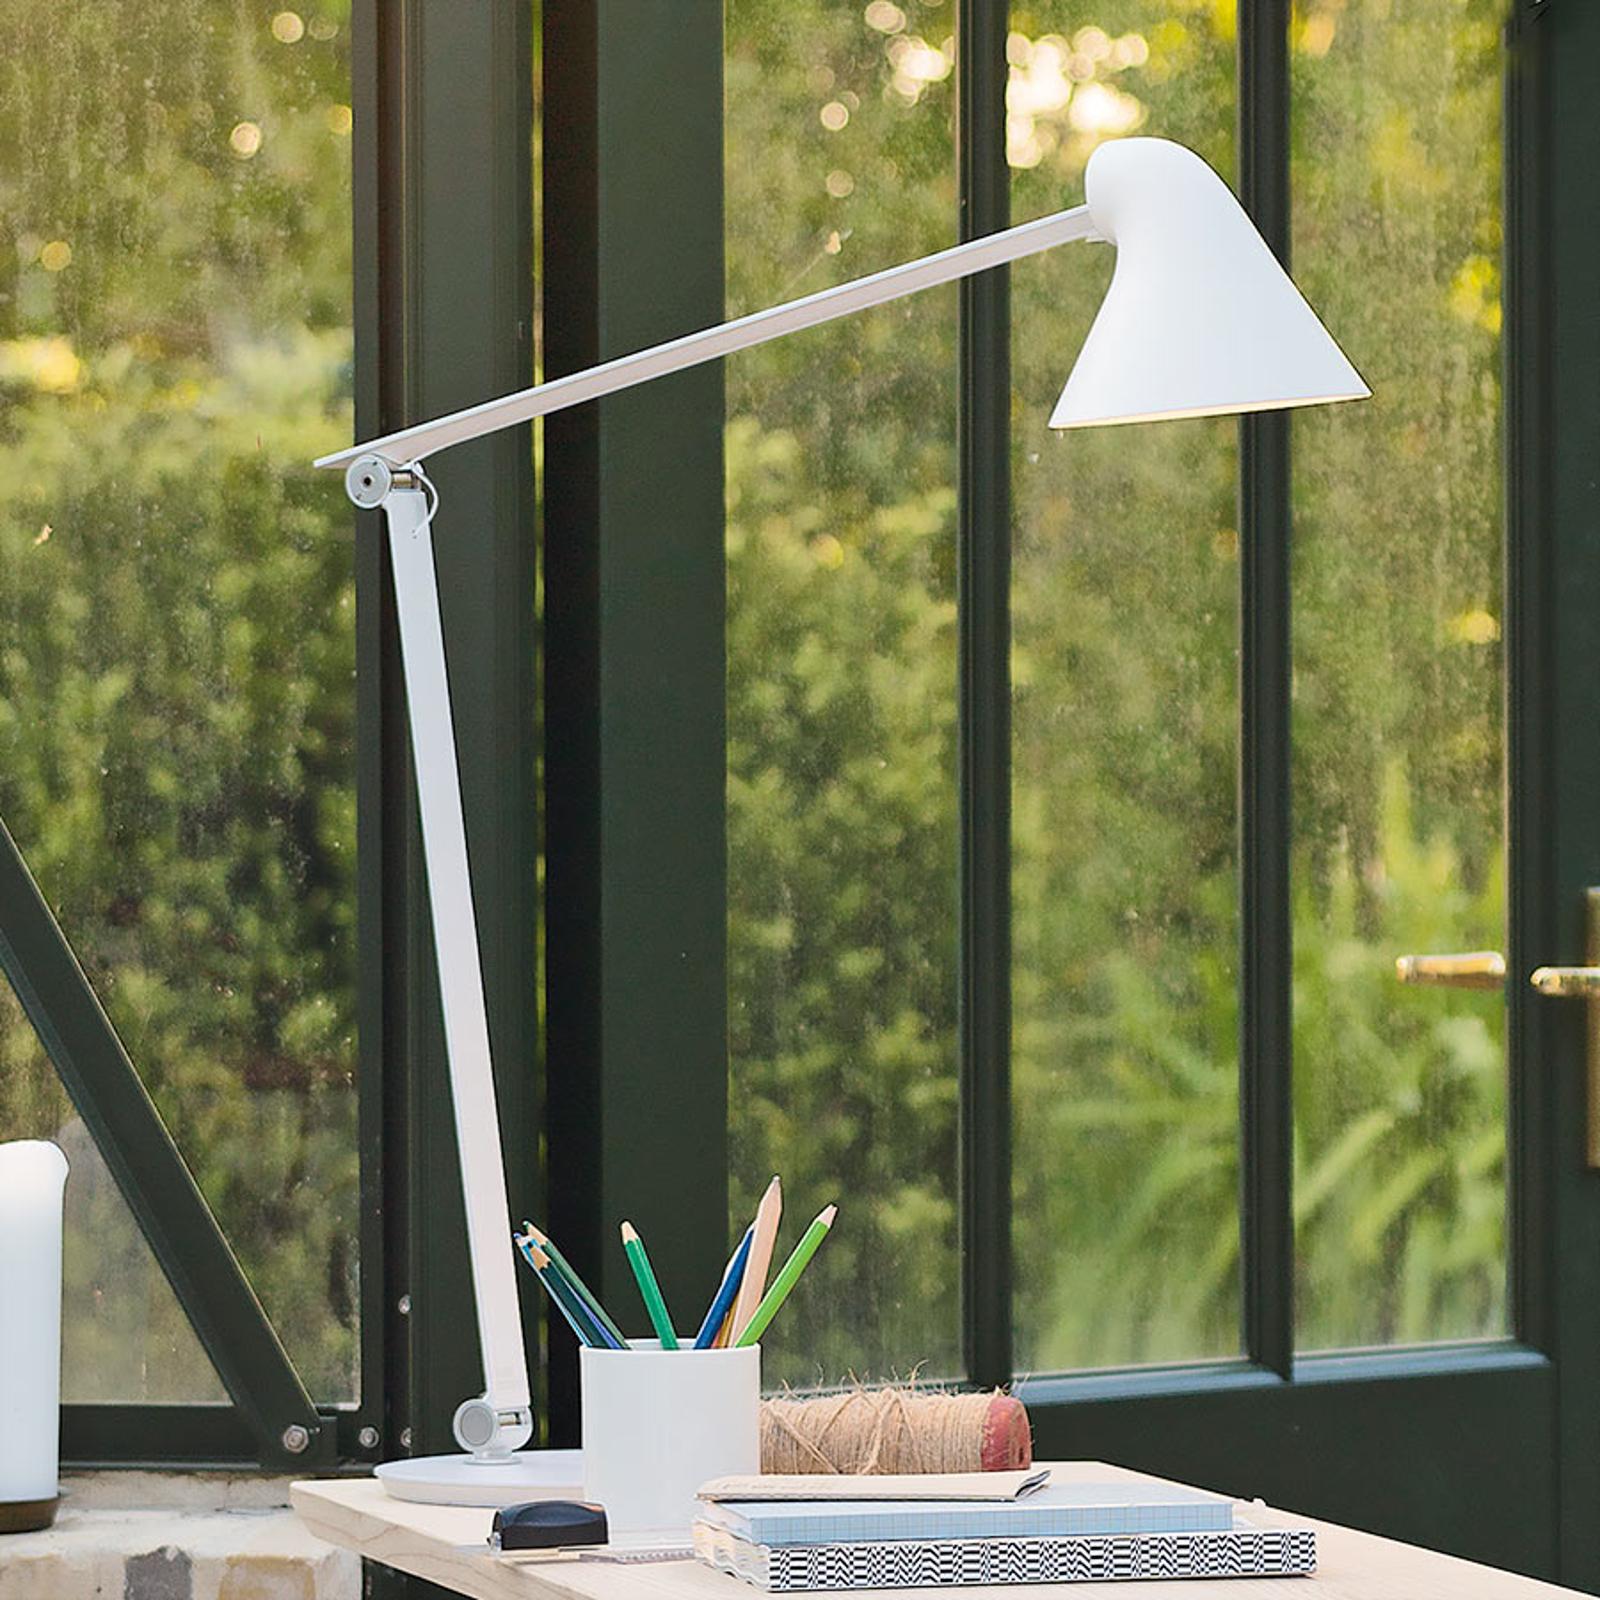 Louis Poulsen NJP tafellamp voet 2.700 K wit